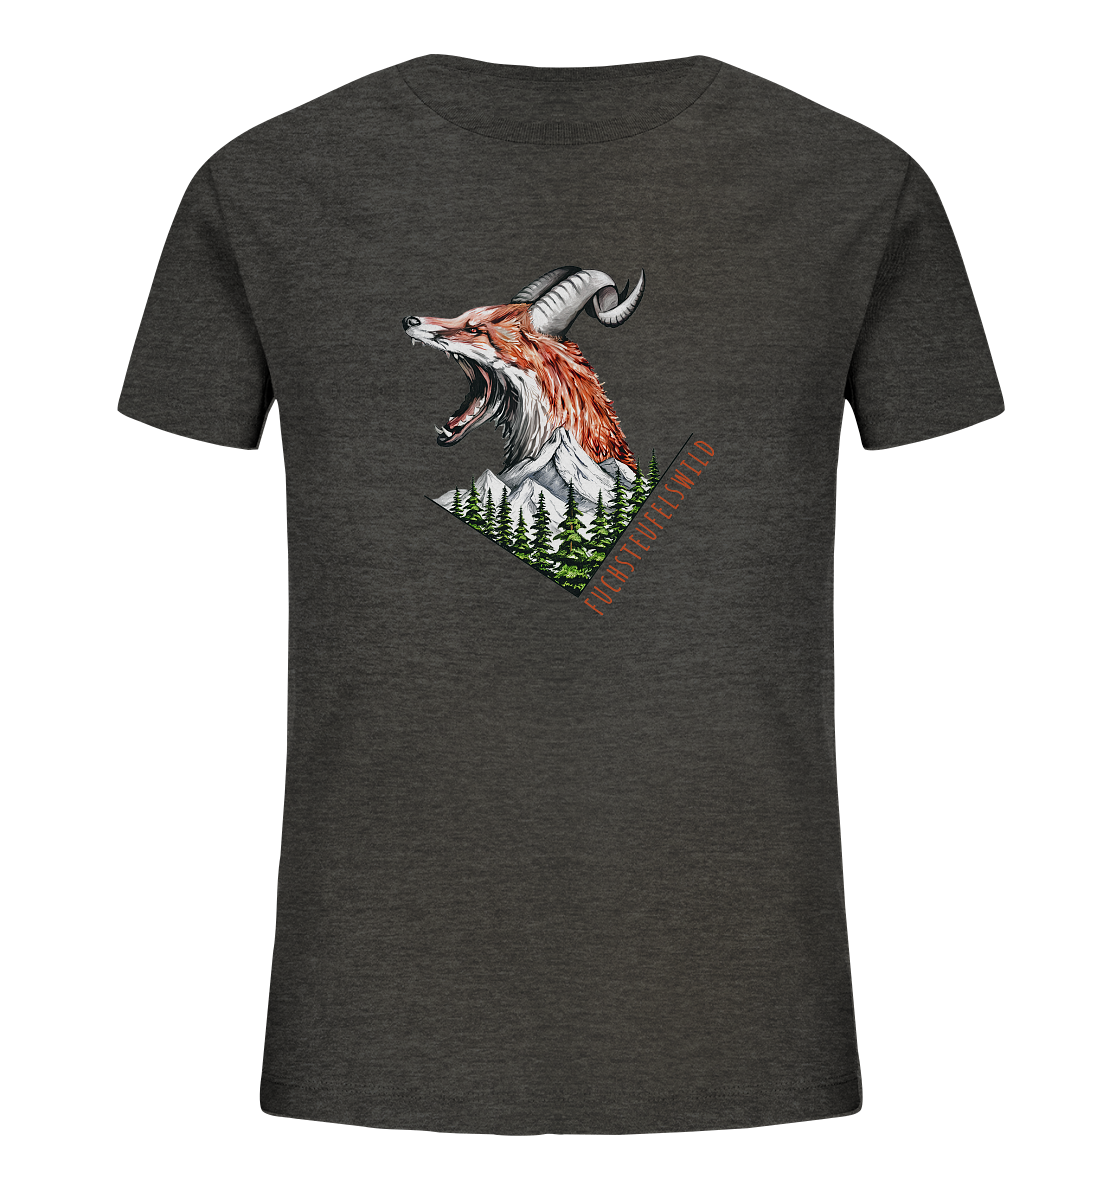 front-kids-organic-shirt-252625-1116x.png